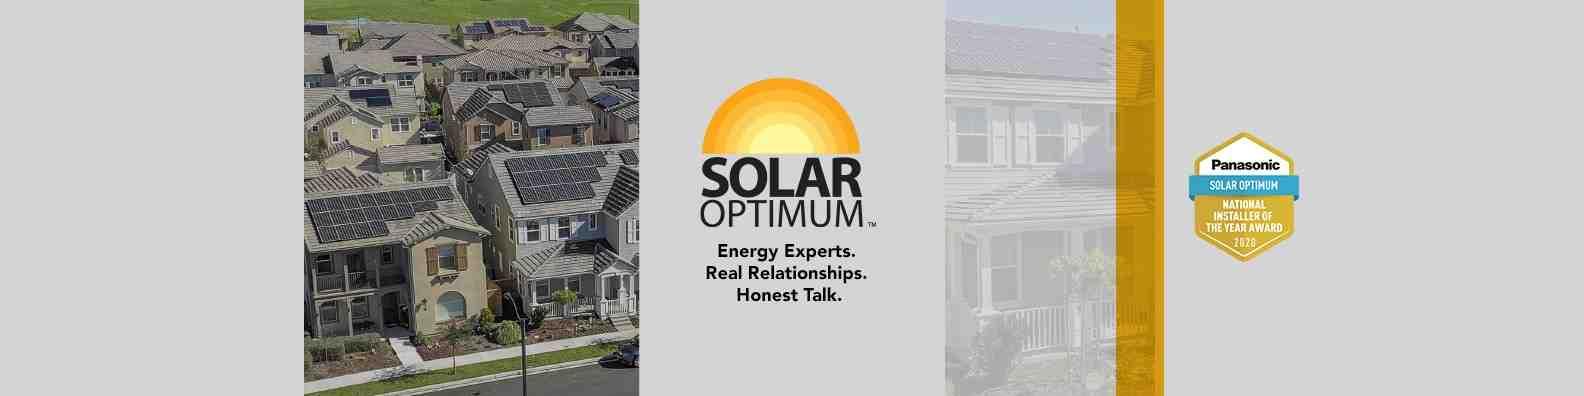 How long has solar optimum been in business?